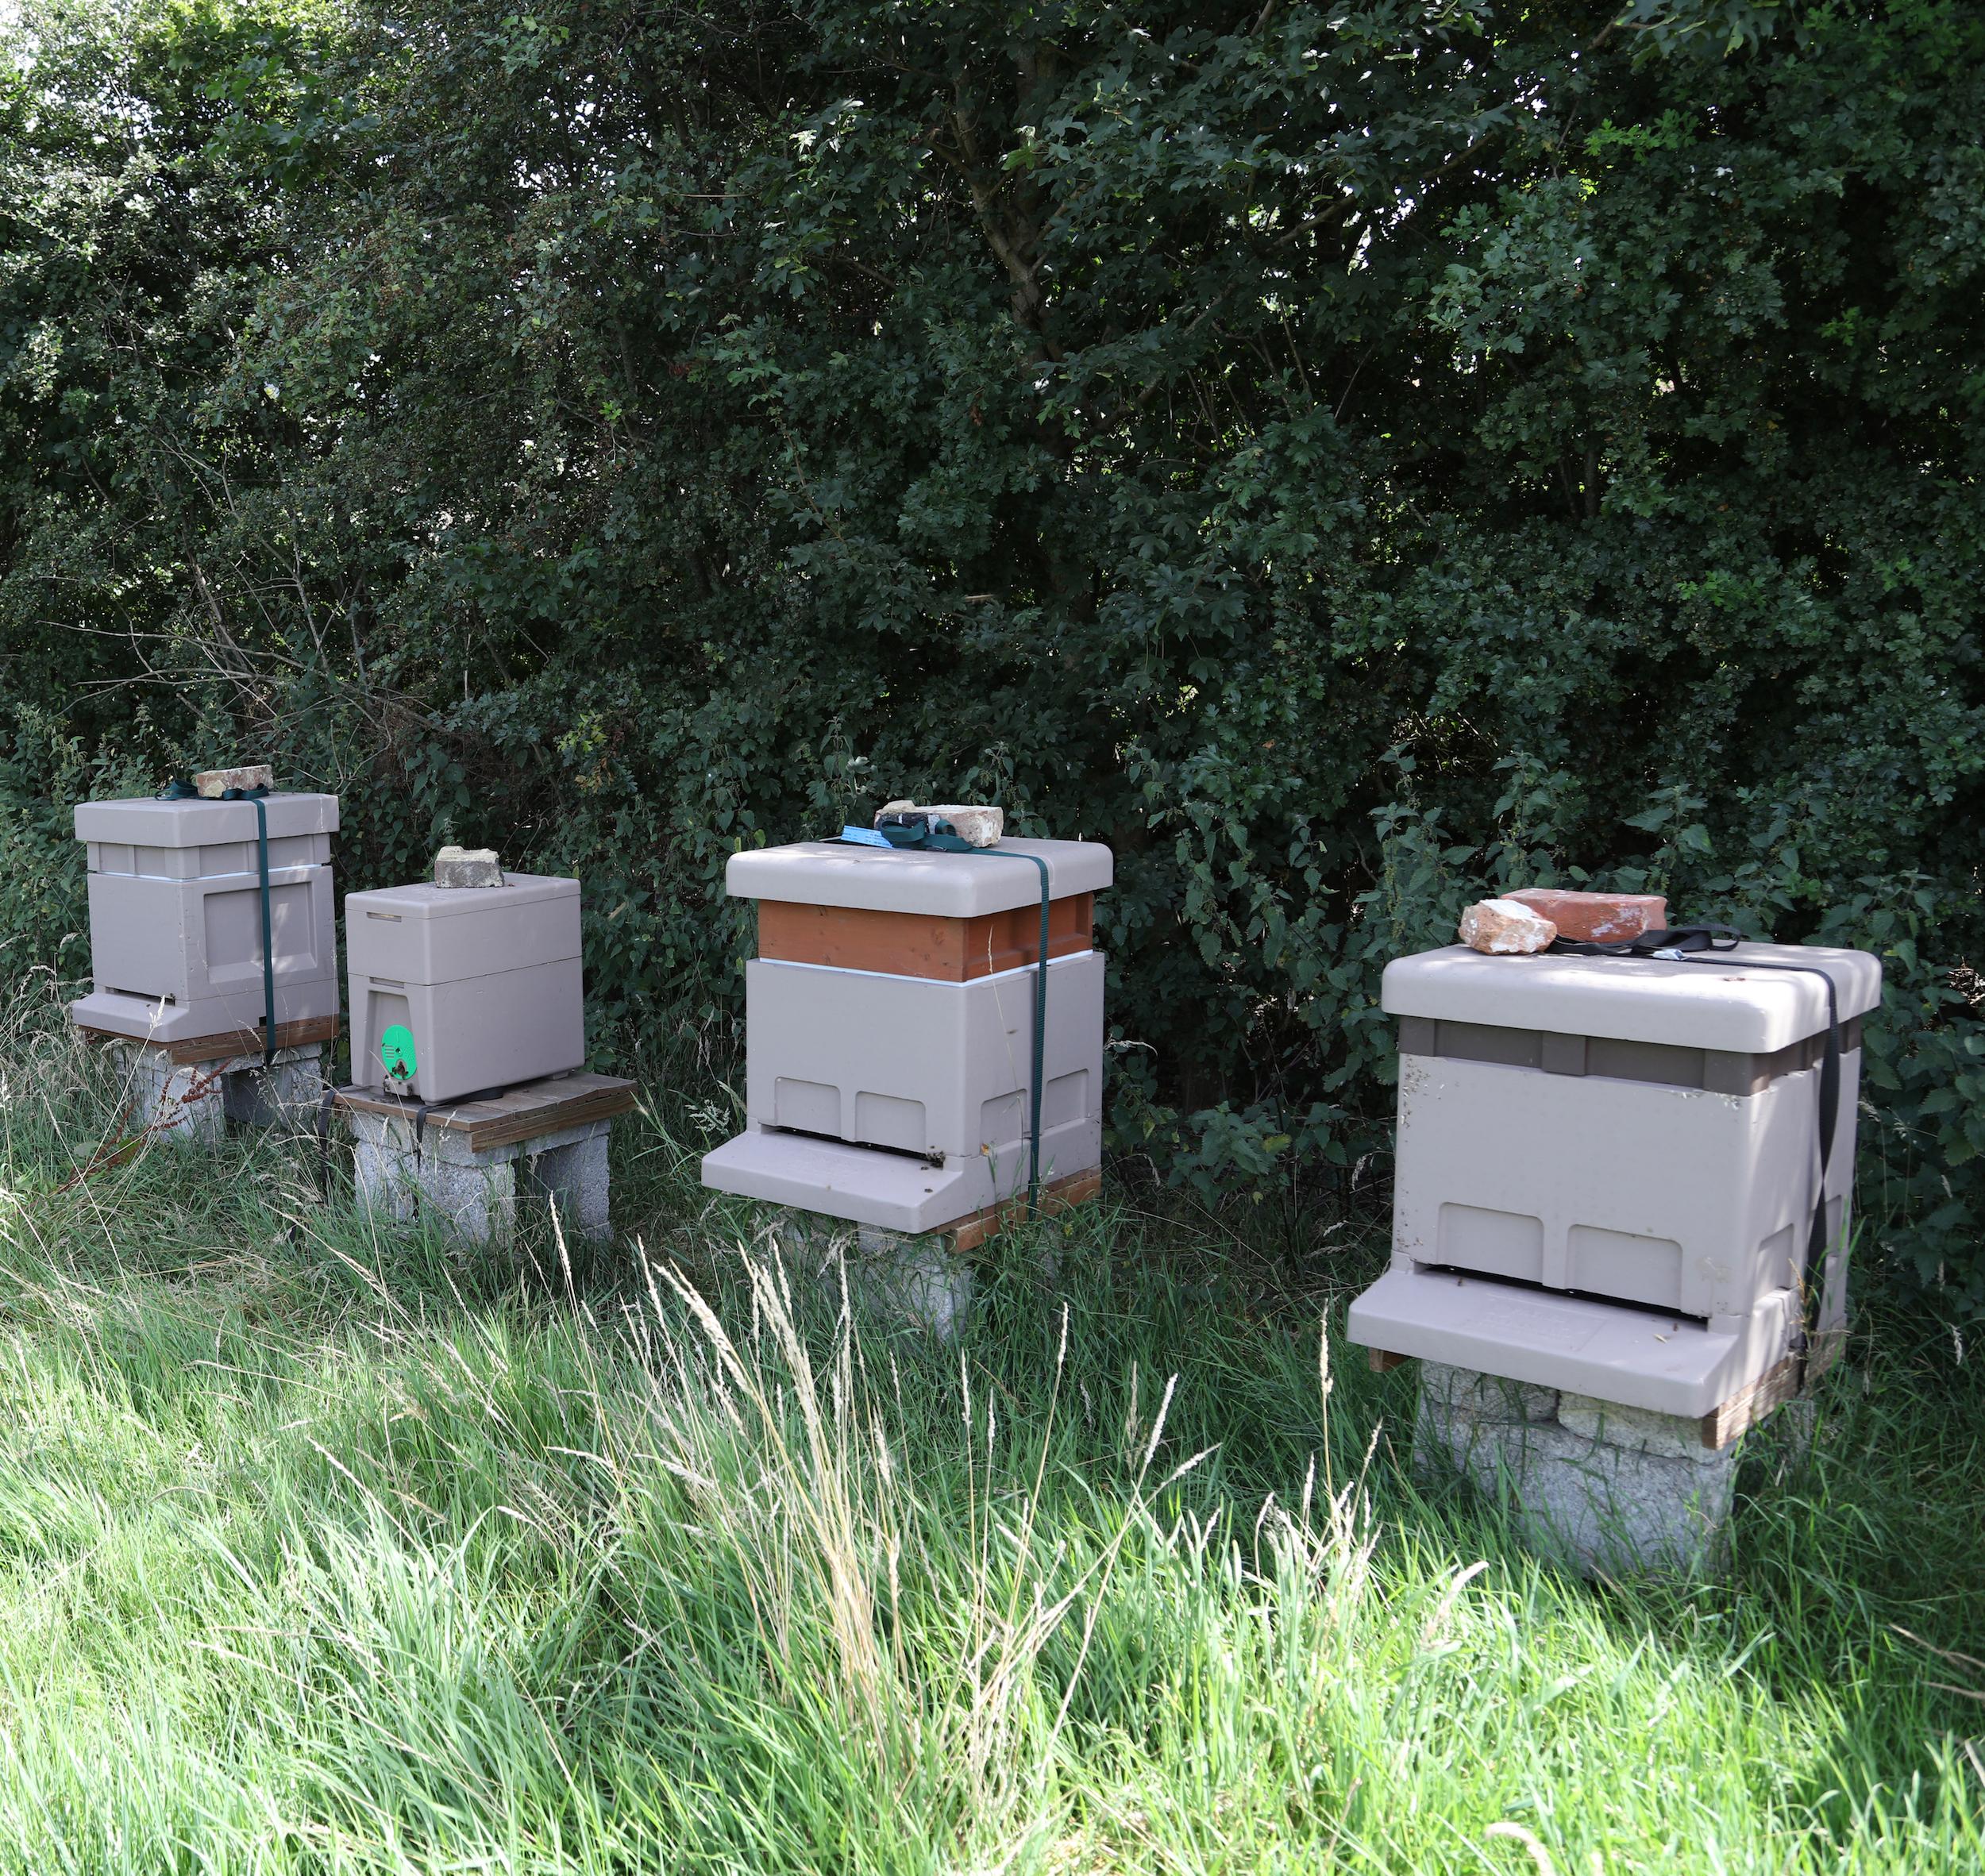 sinah common honey apiaries